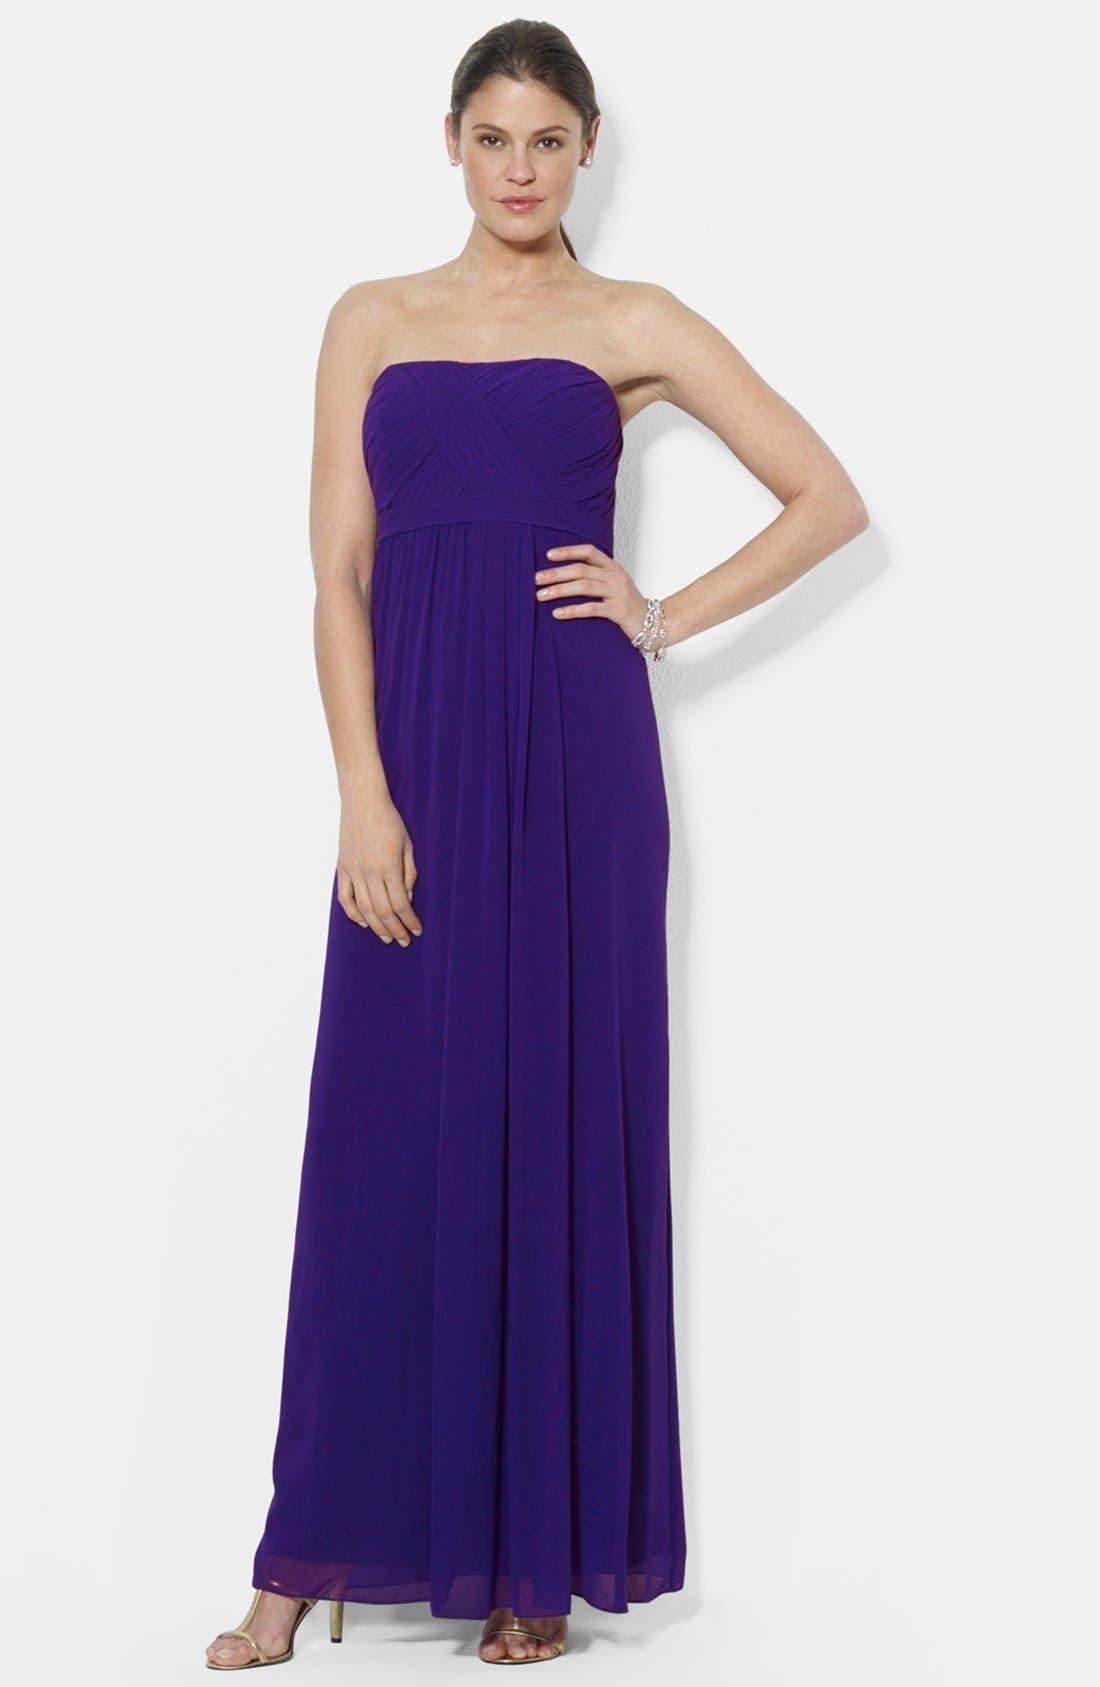 Main Image - Lauren Ralph Lauren Strapless Gathered Empire Gown